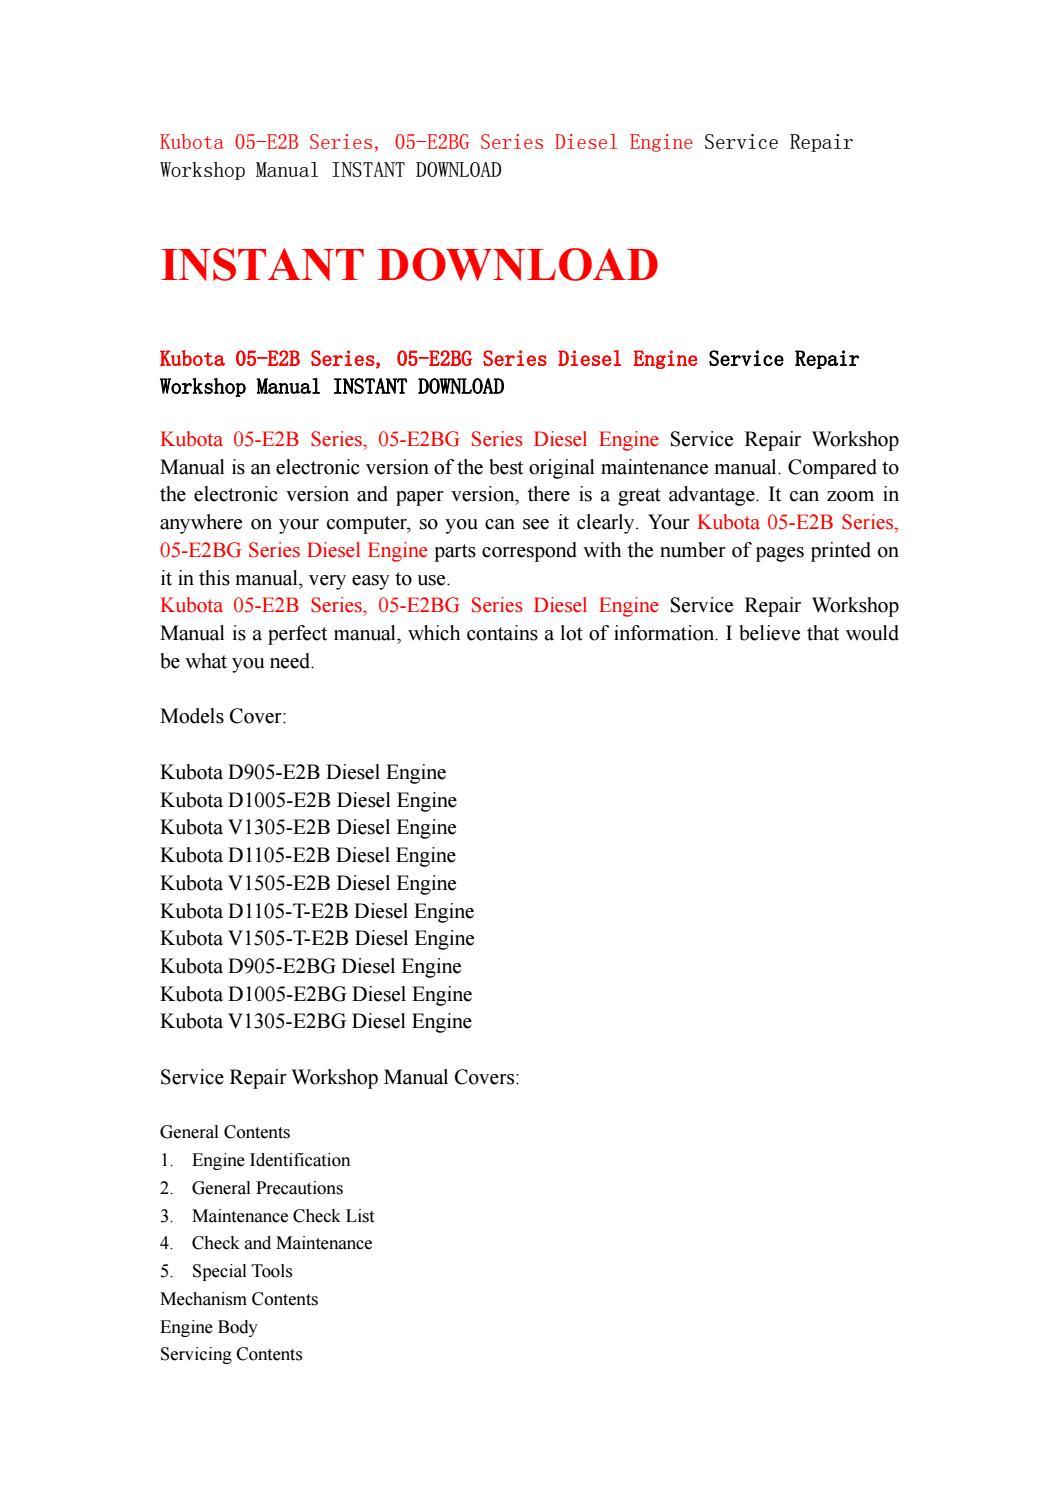 Kubota 05 e2b series, 05 e2bg series diesel engine service repair workshop  manual instant download by kjjsefhsjef - issuu